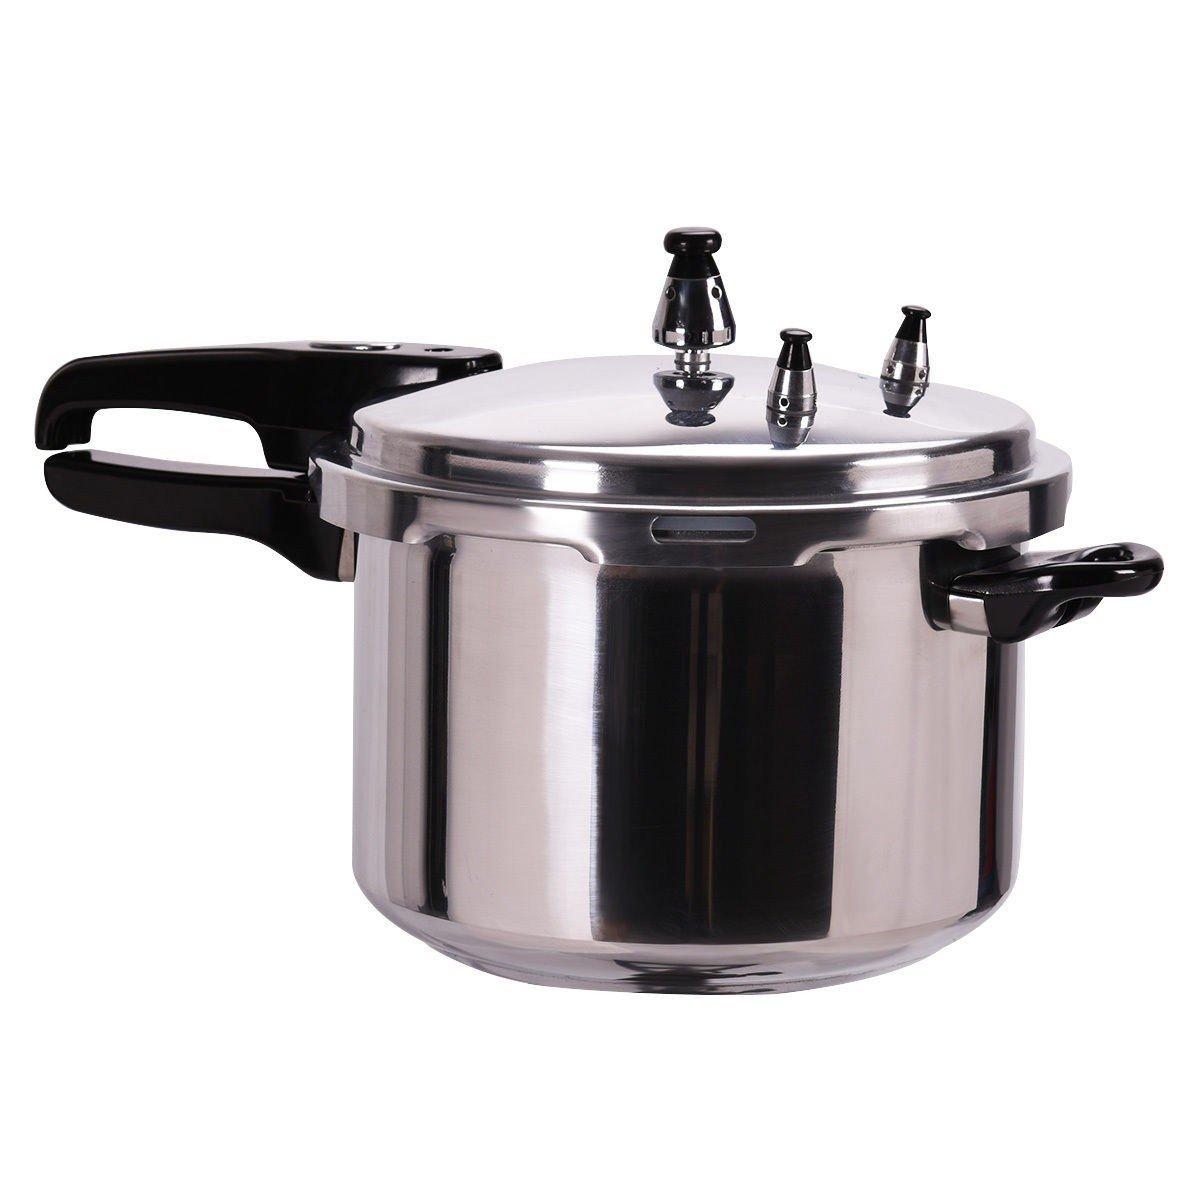 6-Quart Aluminum Pressure Cooker Fast Cooker Canner Pot Kitchen